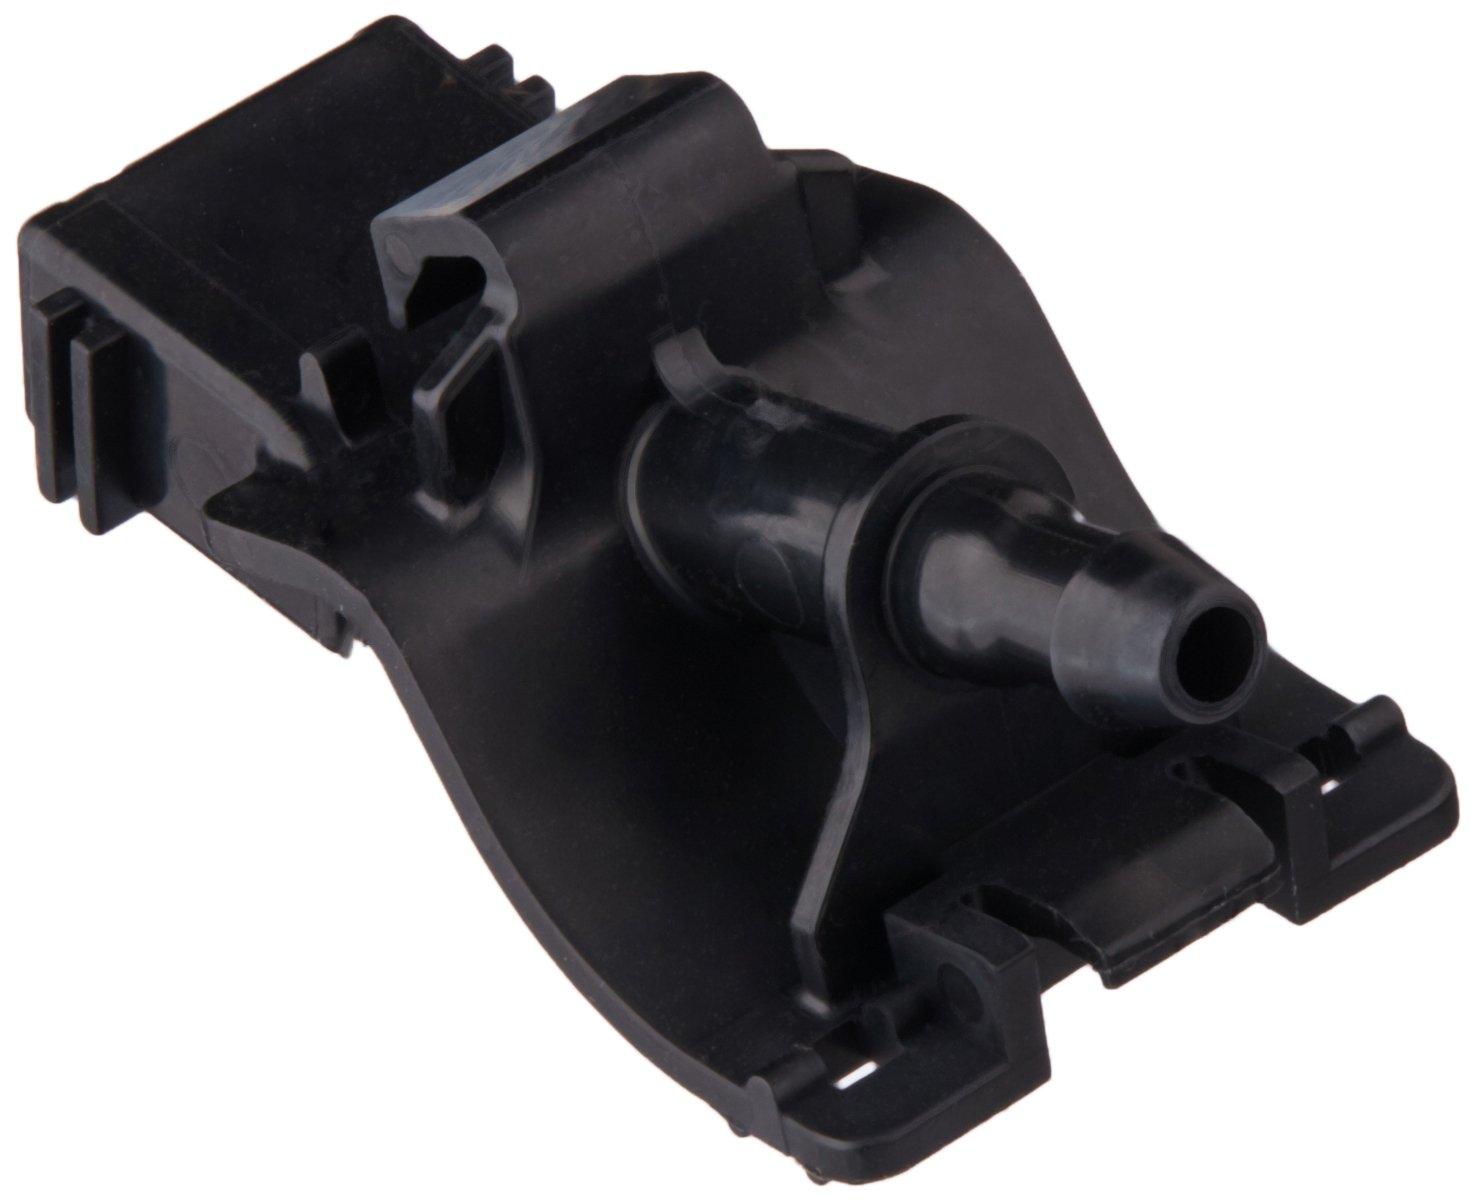 Genuine Toyota 85381-30180 Windshield Washer Nozzle Sub Assembly